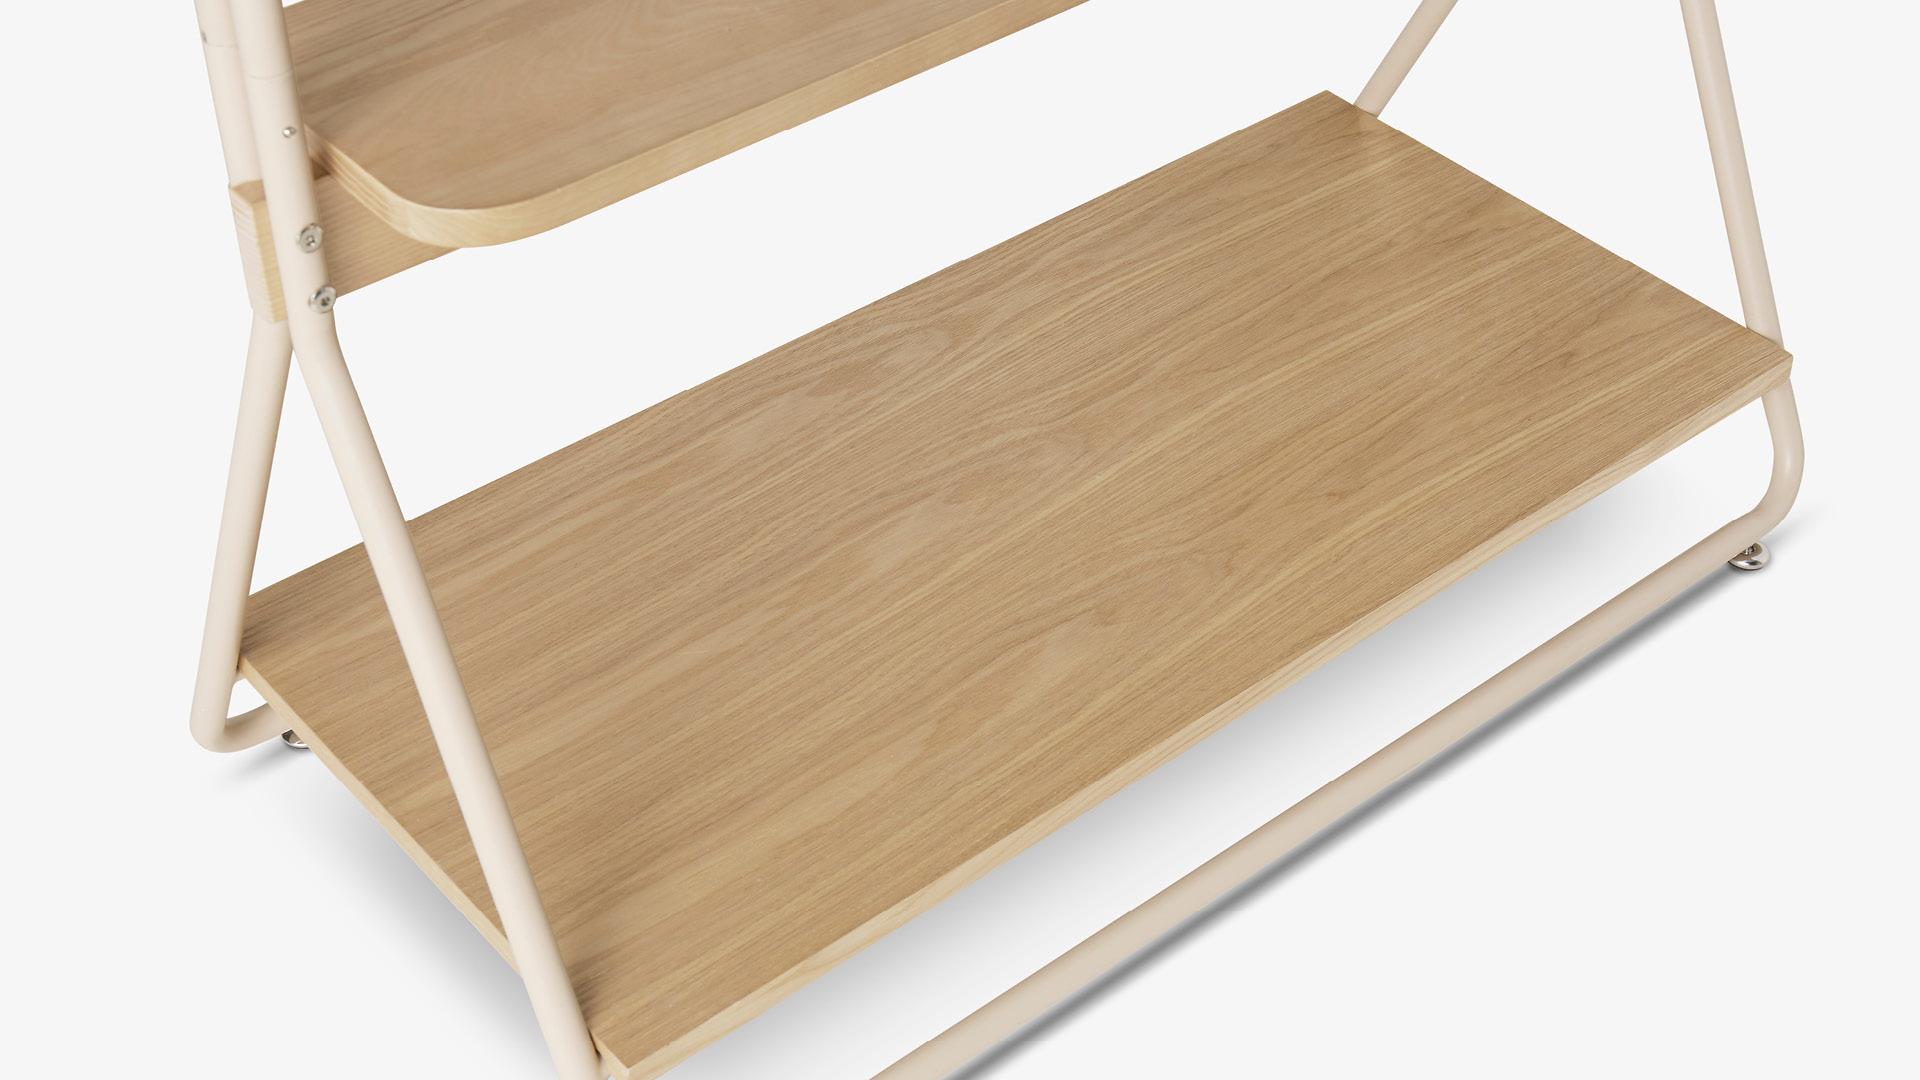 FAS级白蜡木+实木木皮360°封边<br/>日常可触温润木感